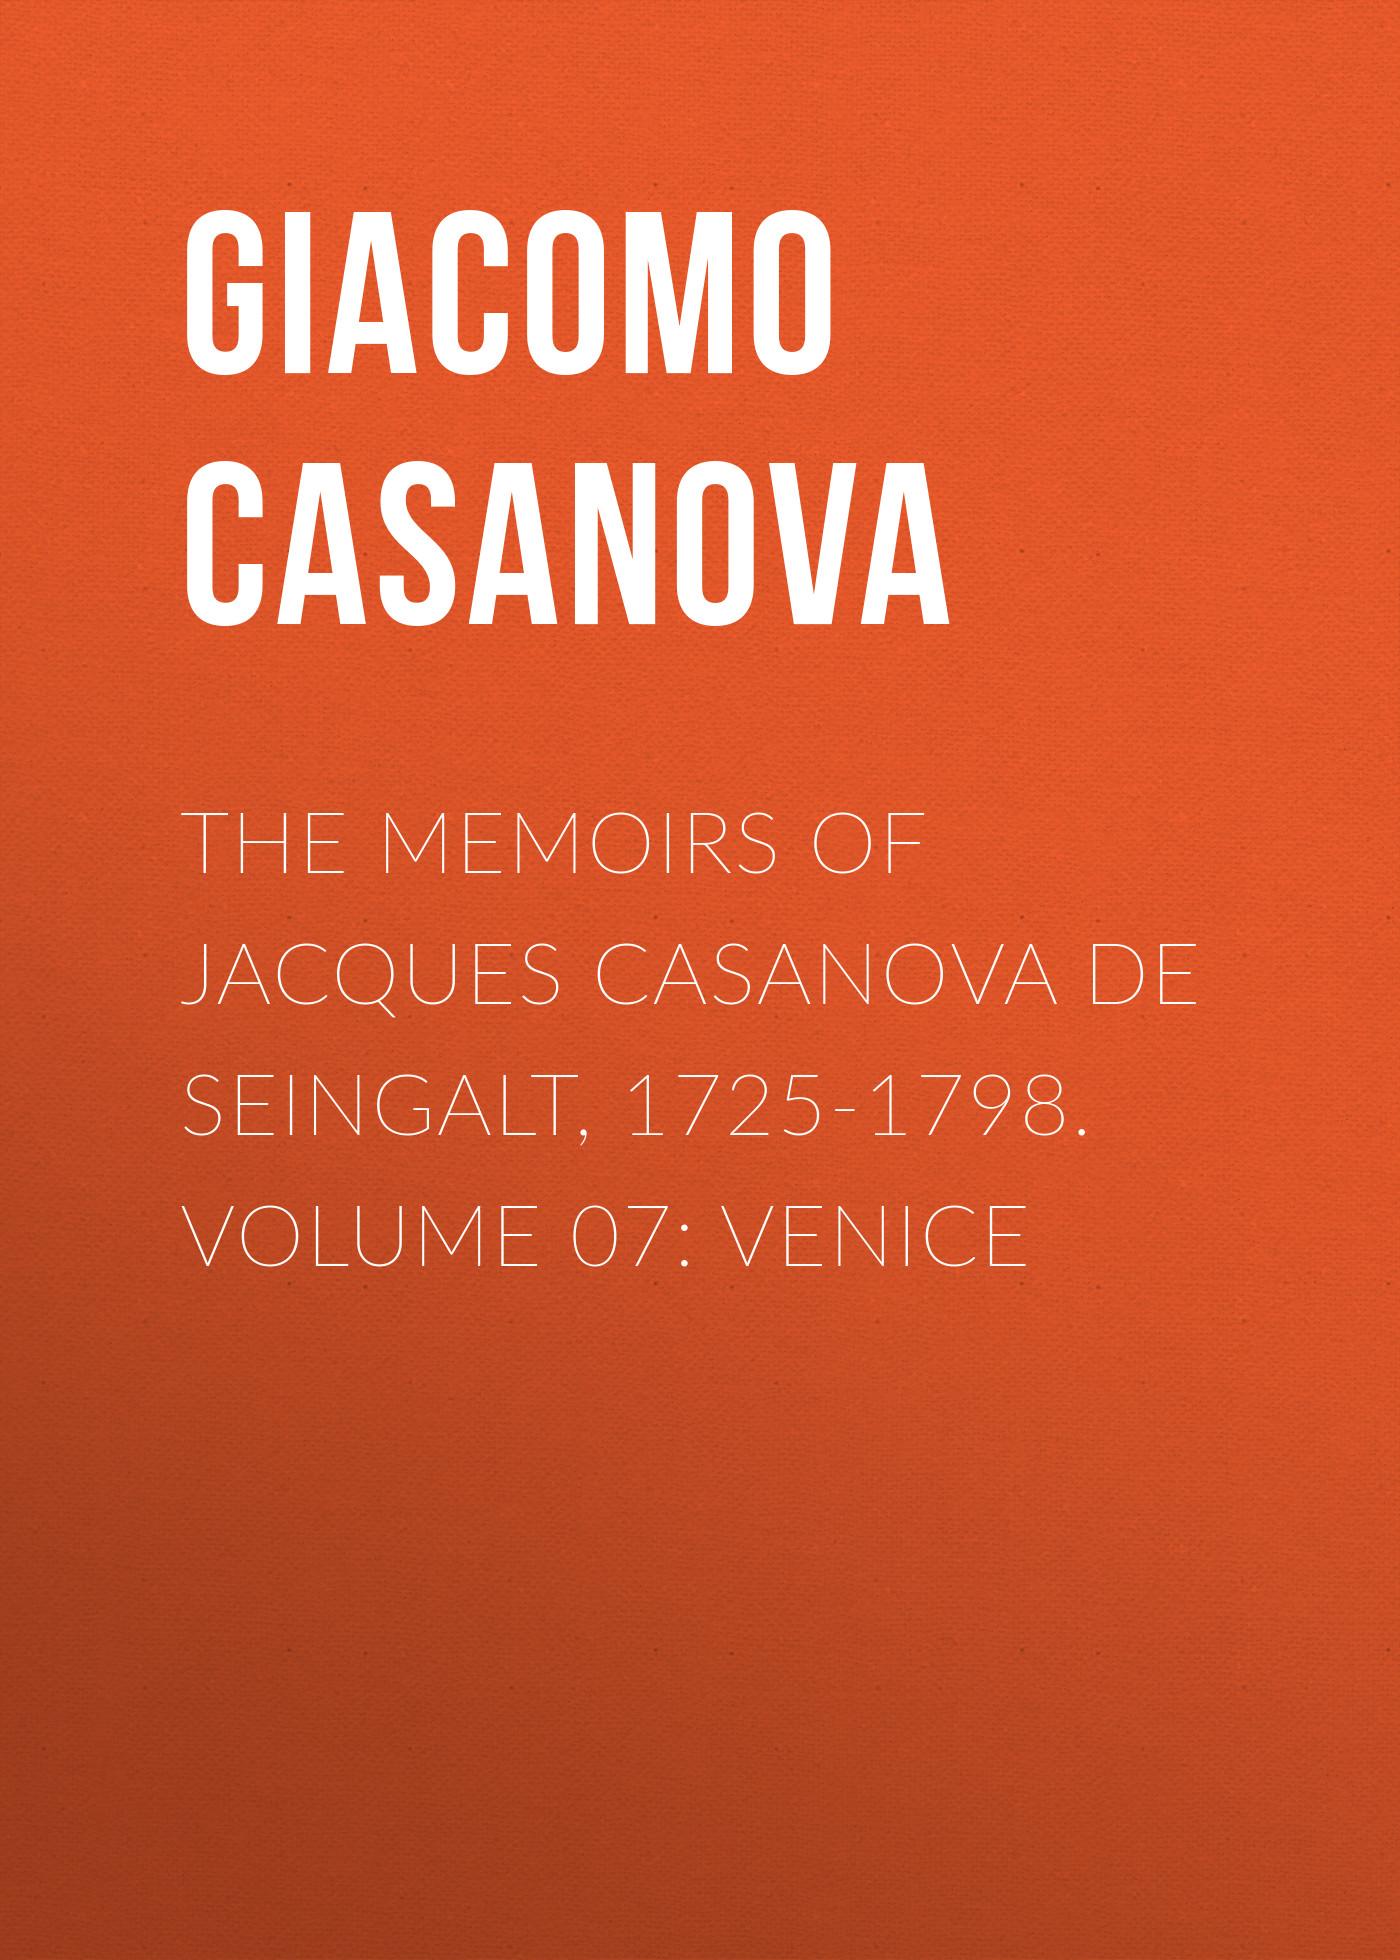 Giacomo Casanova The Memoirs of Jacques Casanova de Seingalt, 1725-1798. Volume 07: Venice giacomo casanova the memoirs of jacques casanova de seingalt 1725 1798 volume 20 milan